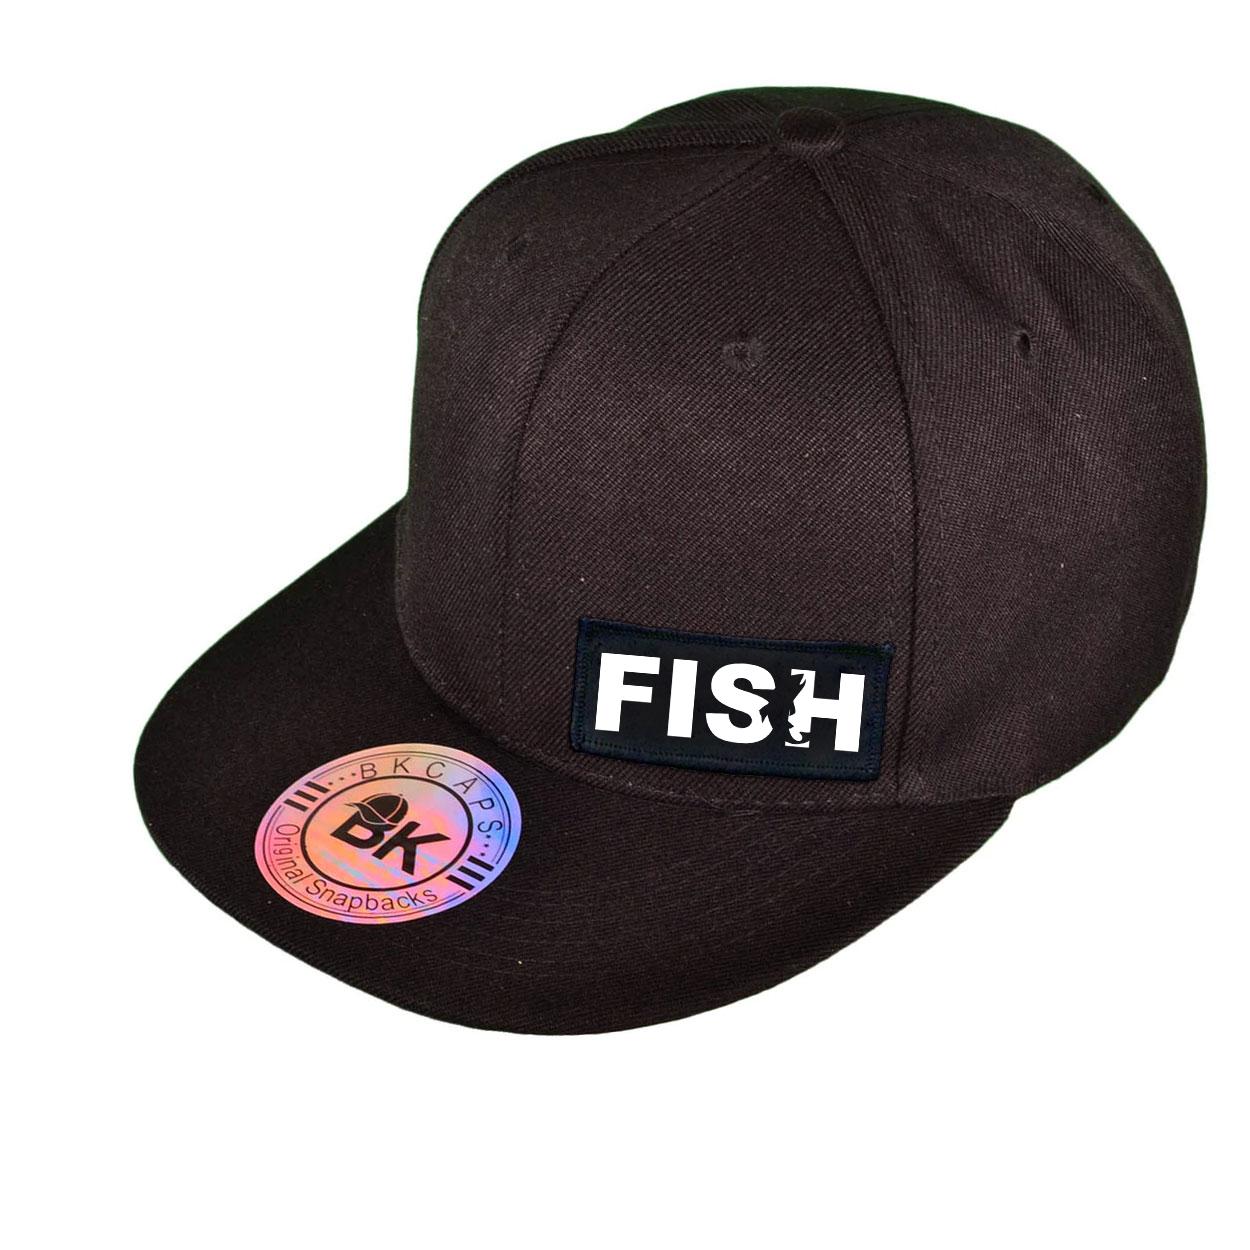 Fish Catch Logo Night Out Woven Patch Snapback Flat Brim Hat Black (White Logo)